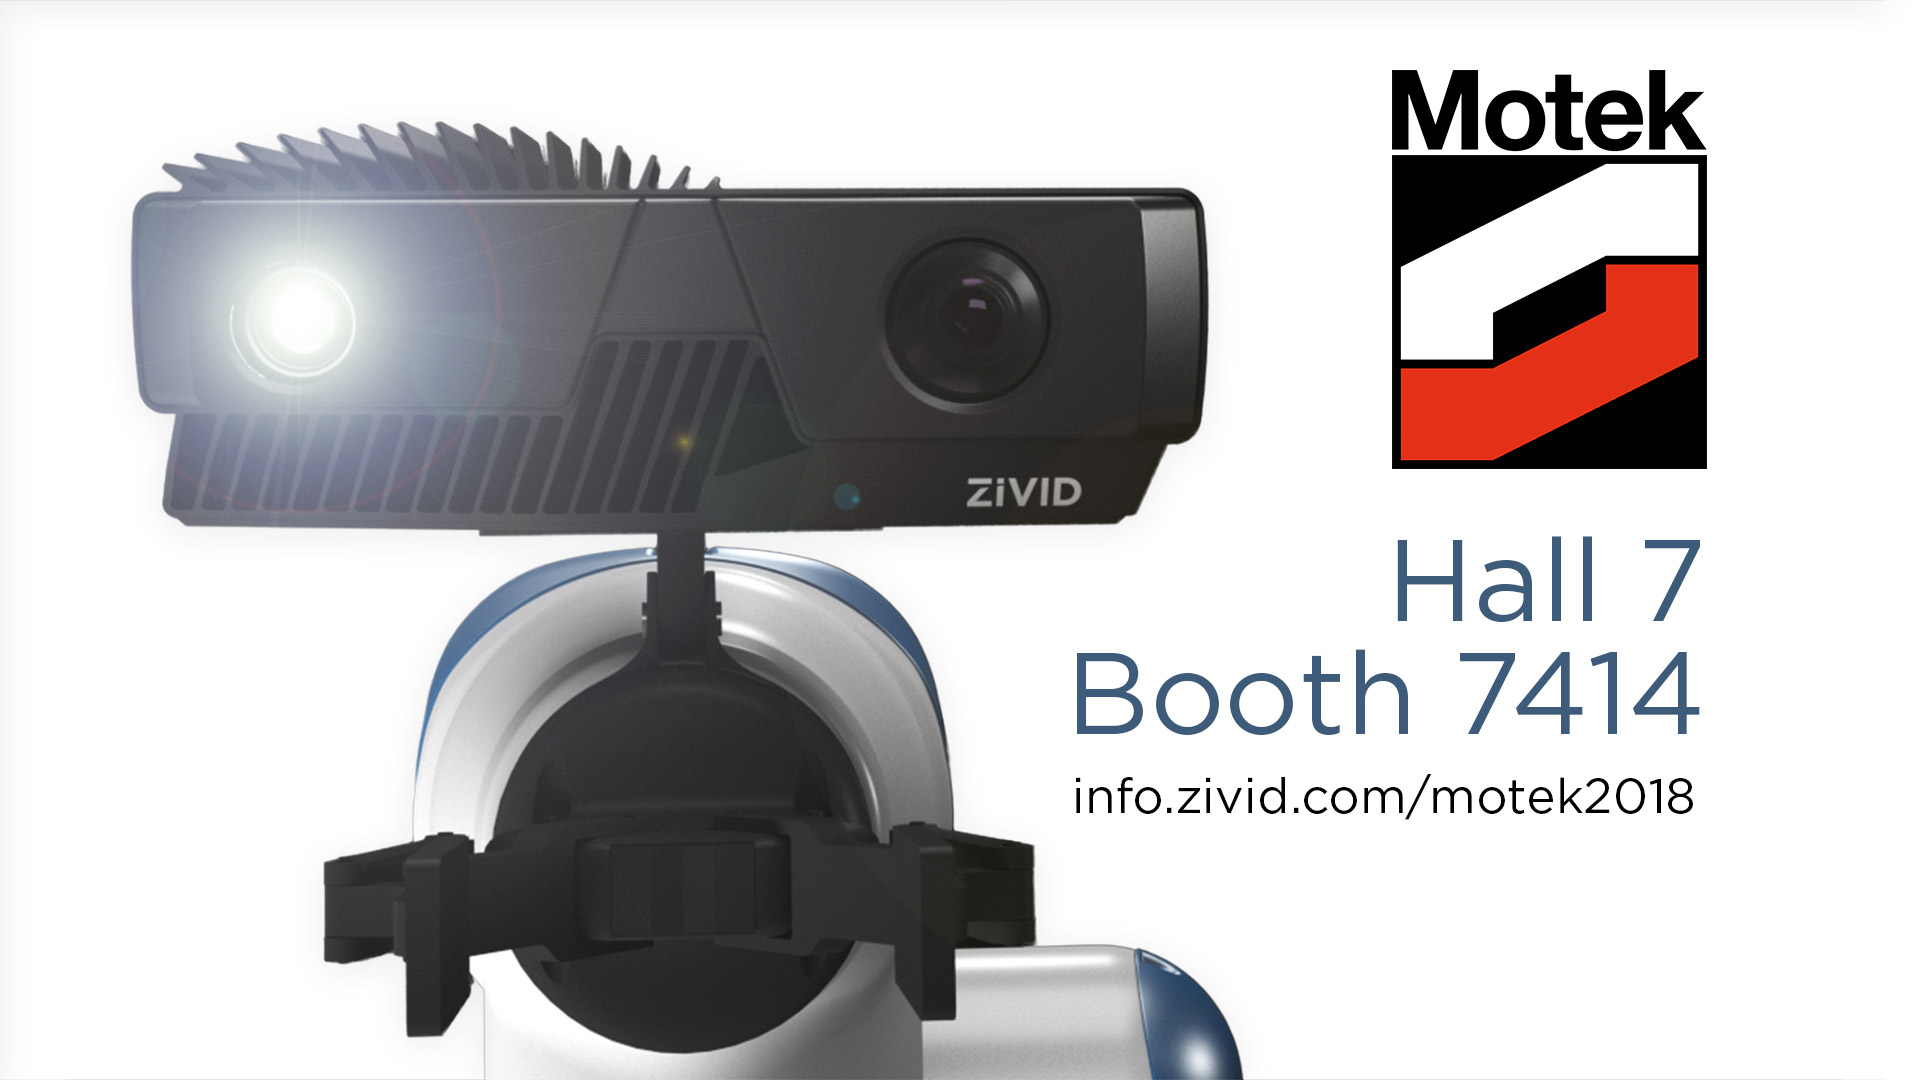 Zivid-3D-Cameras-Motek-2018-www